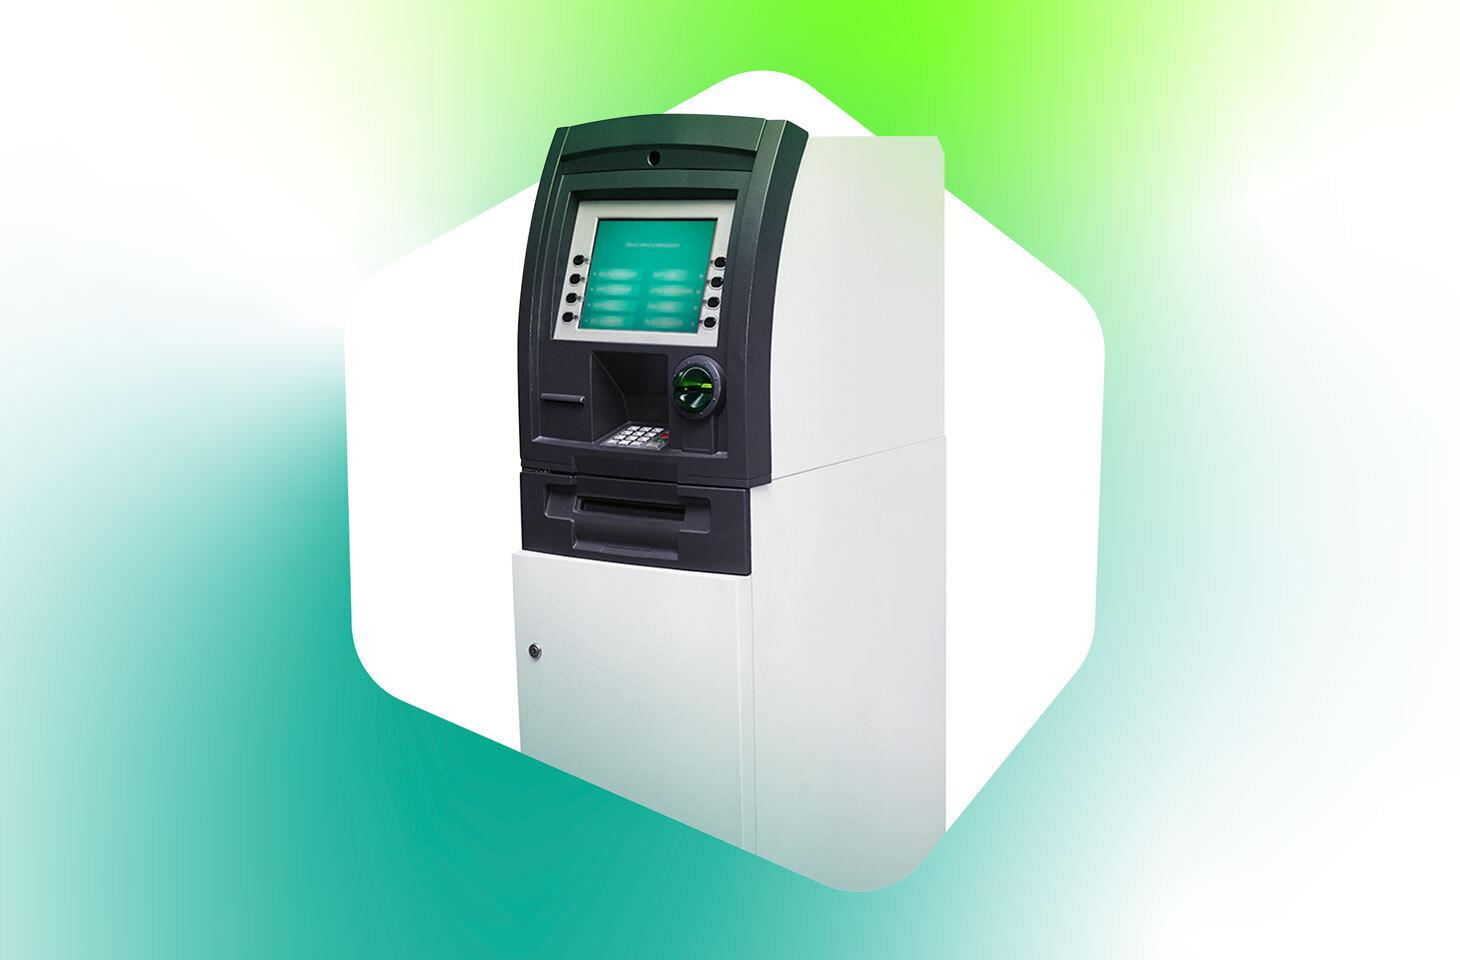 ATMs need quarantines too!